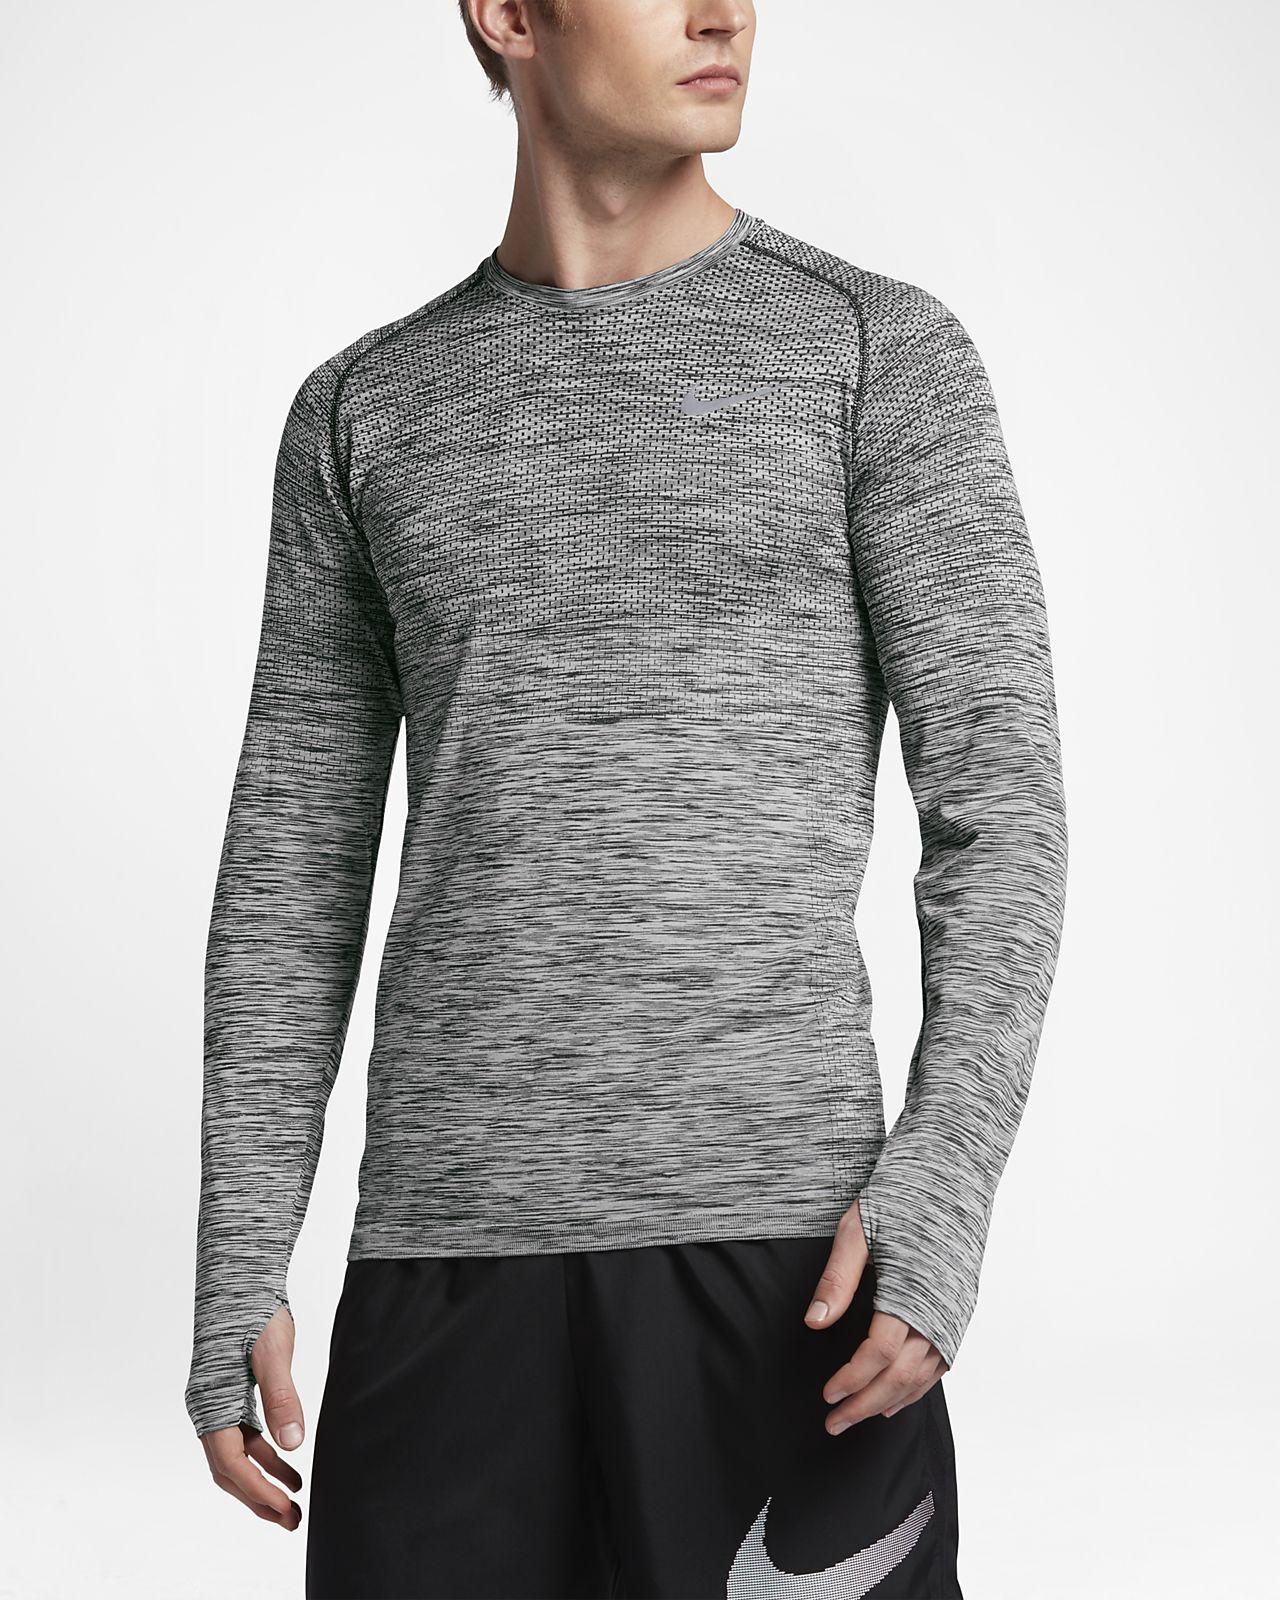 ... Nike Dri-FIT Knit Men's Long-Sleeve Running Top